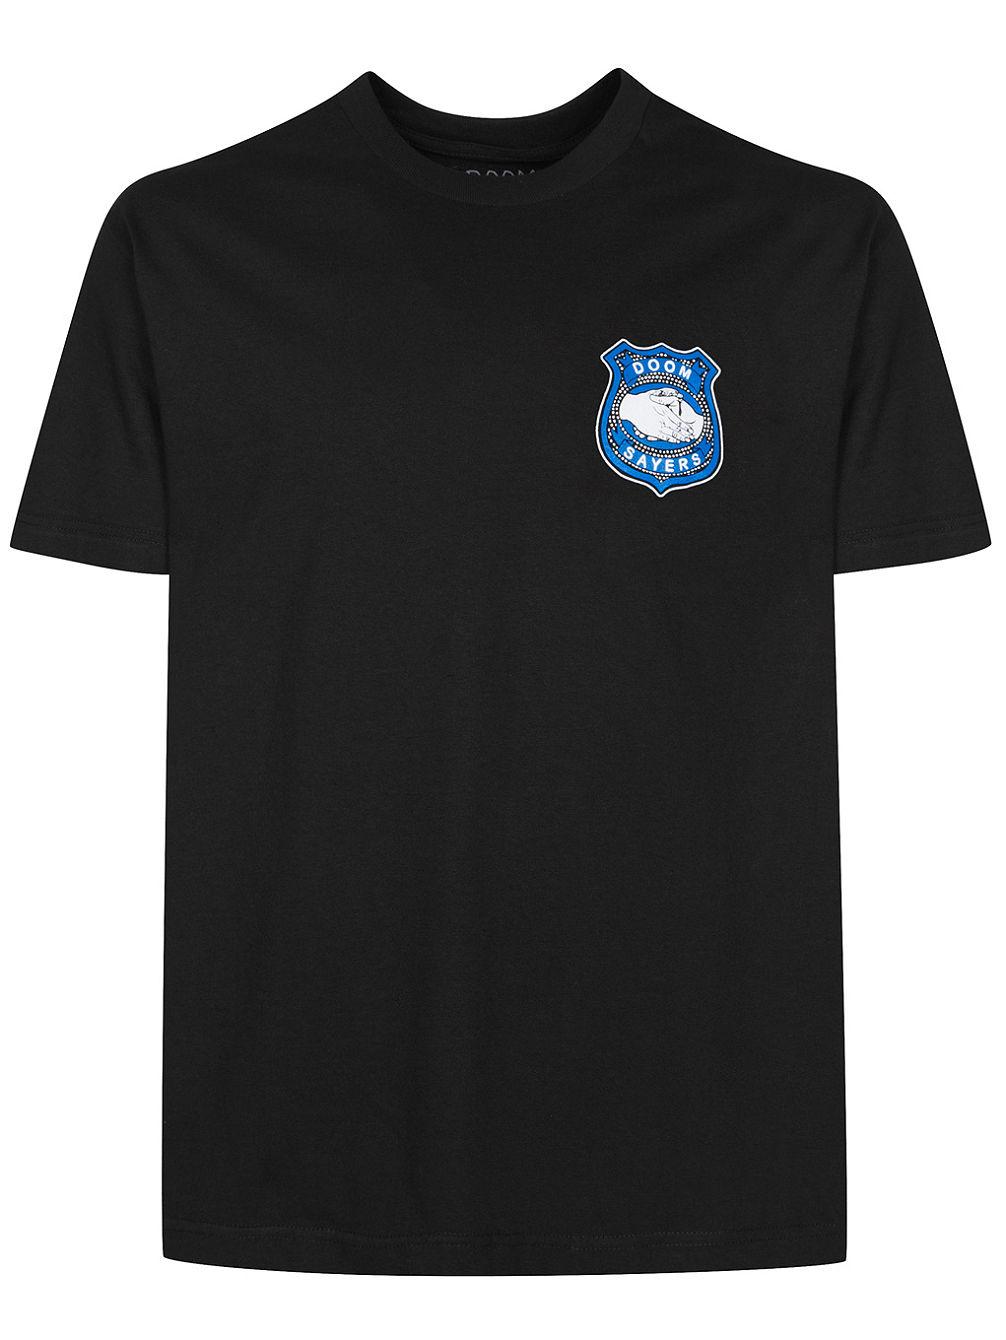 corp-cop-t-shirt